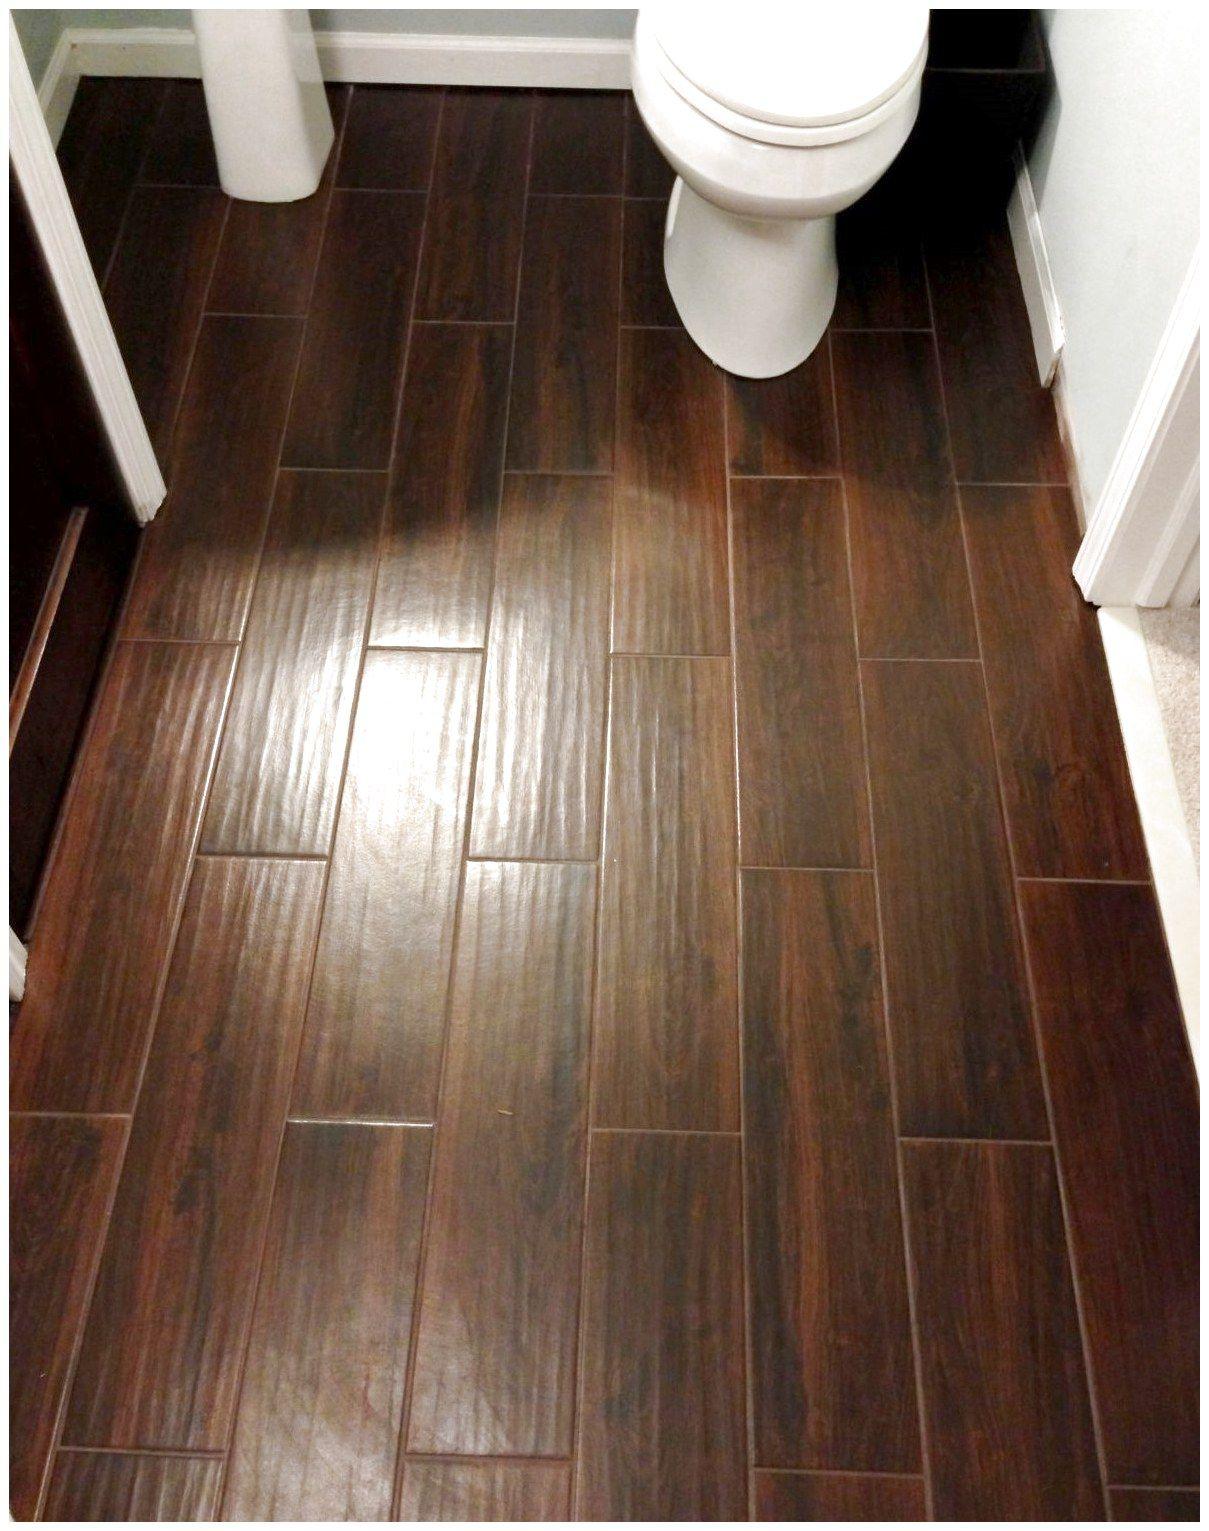 Different Designs for Your Floor Using Ceramics Wood